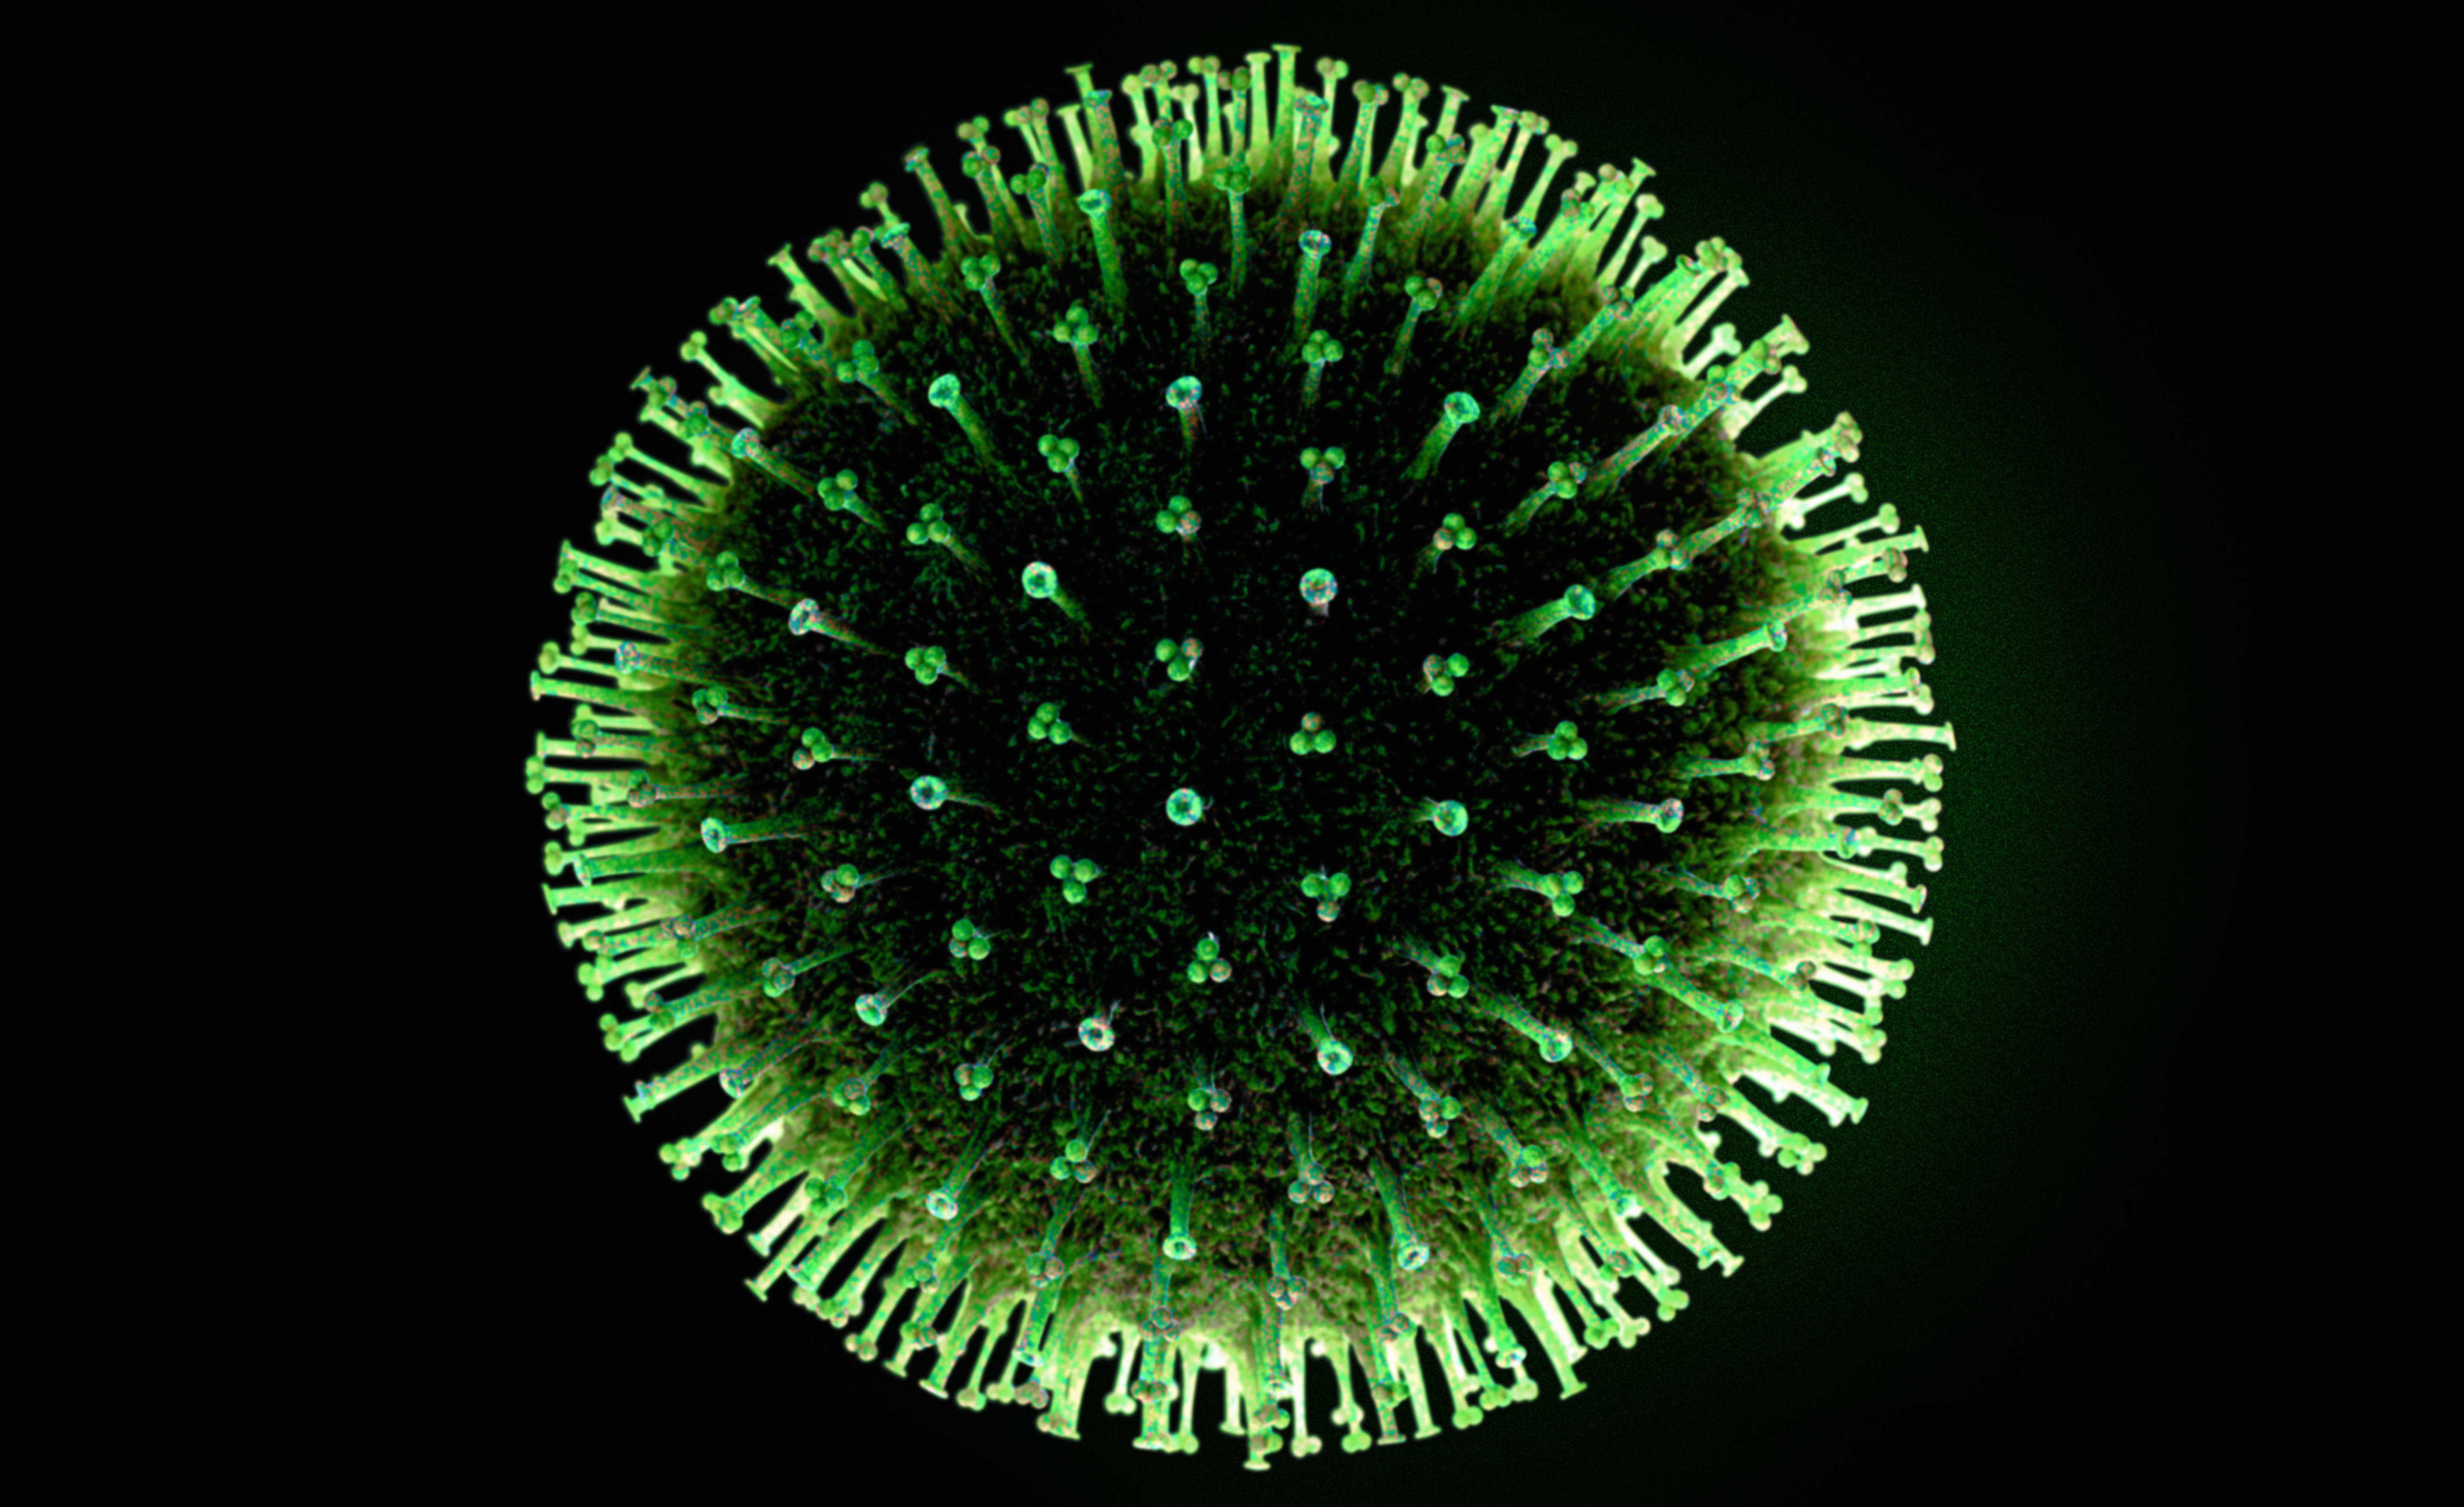 Think this flu virus looks nasty? The giant virus is 20,000 times bigger